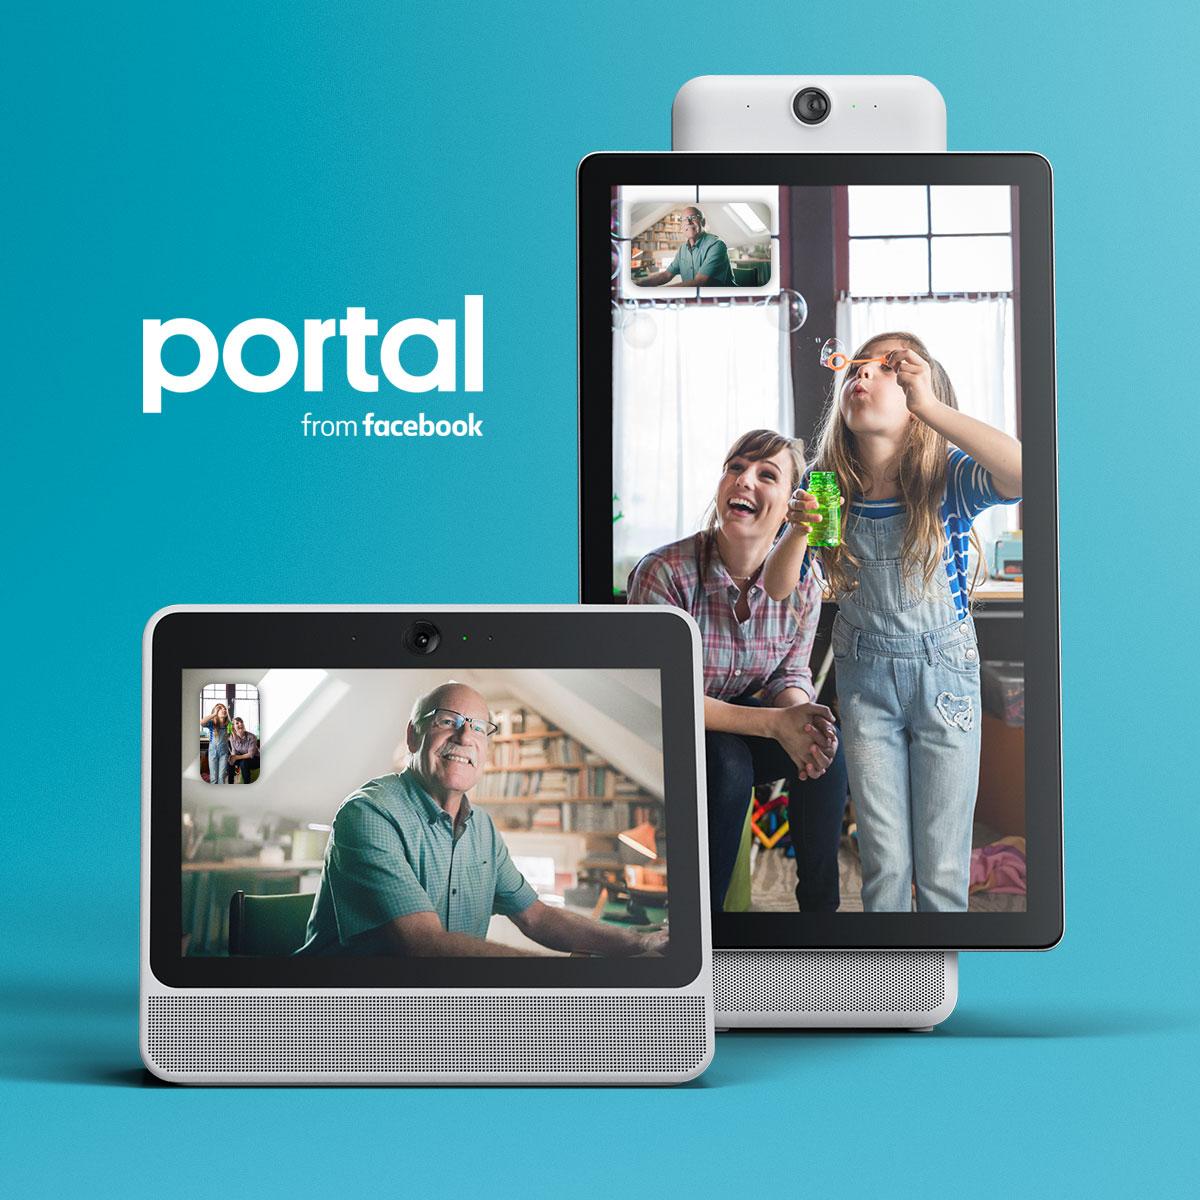 Portal from Facebook: Help Center - Using Portal